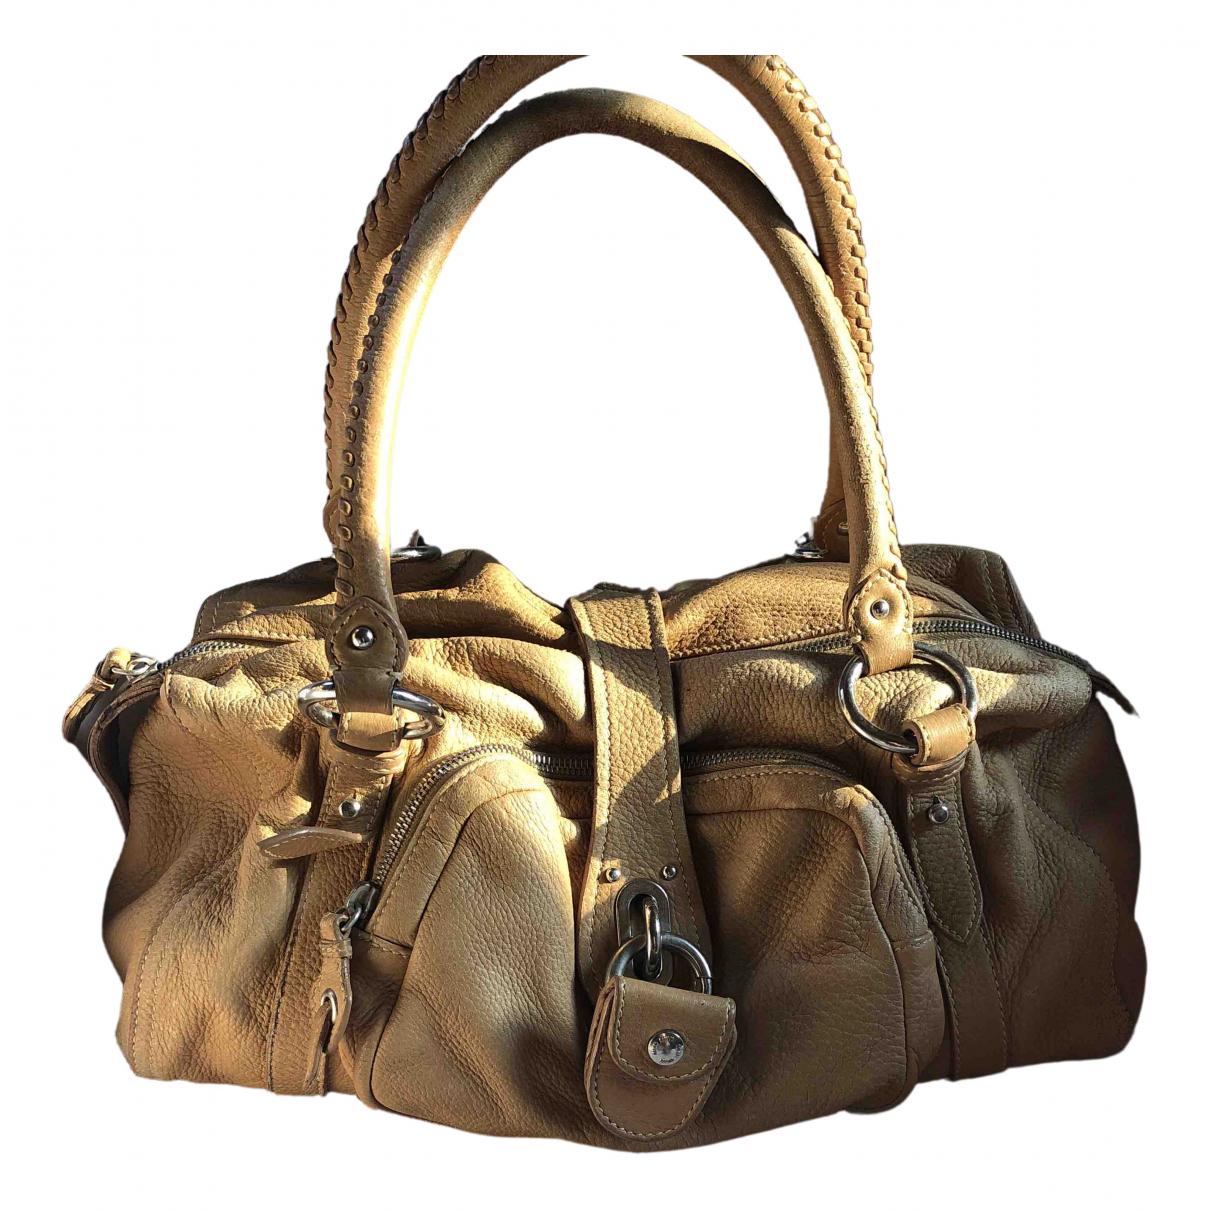 Miu Miu \N Handtasche in  Beige Leder